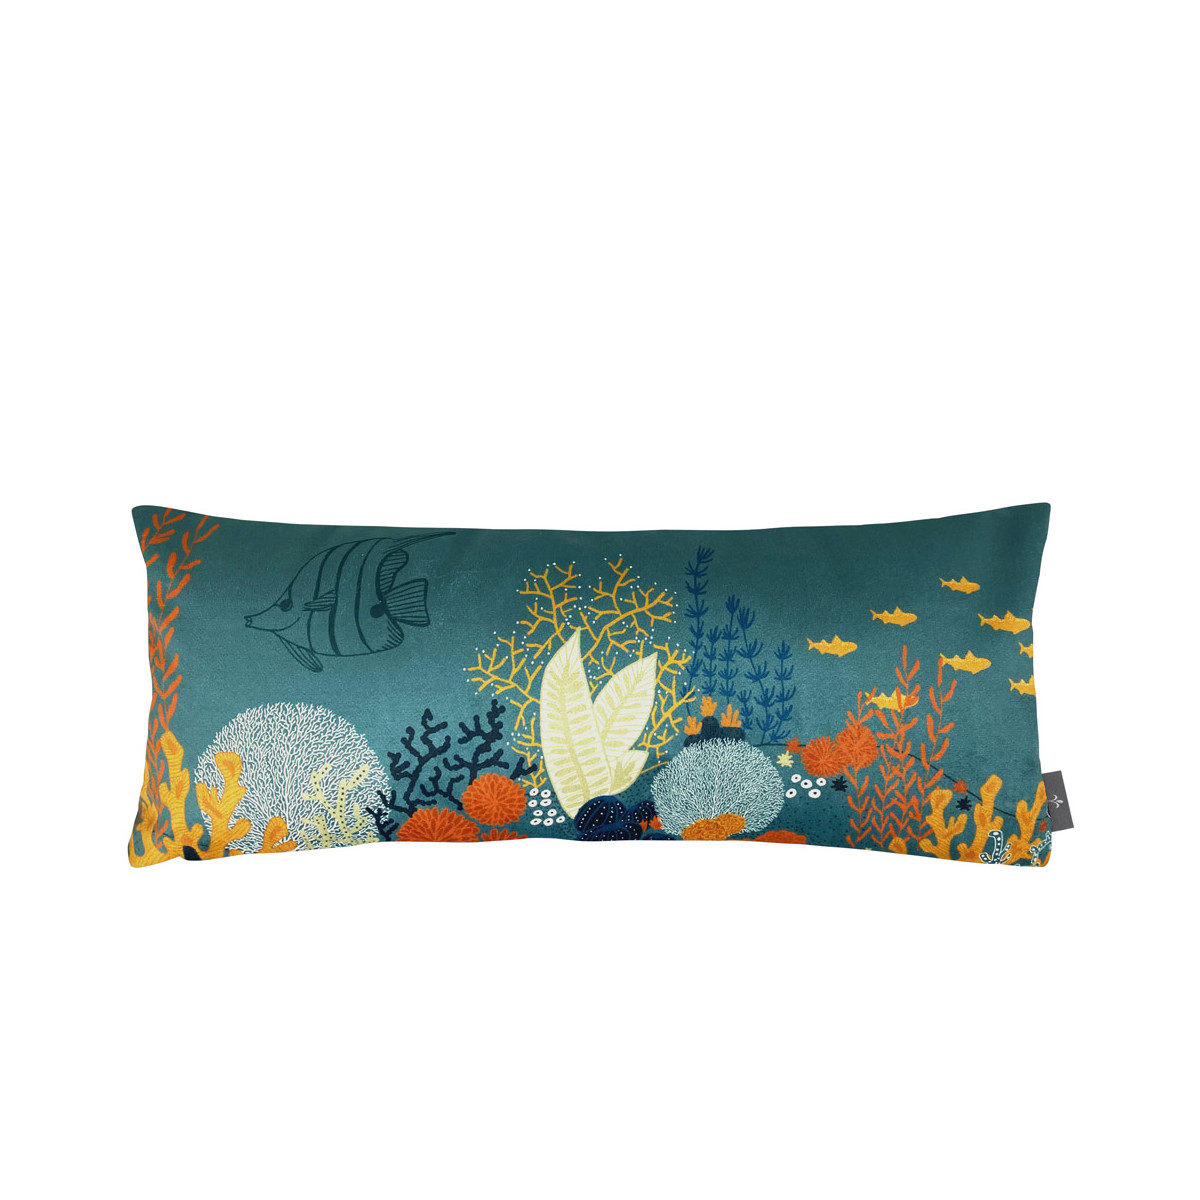 Coussin imprimé la jungle marine made in france bleu 25x60